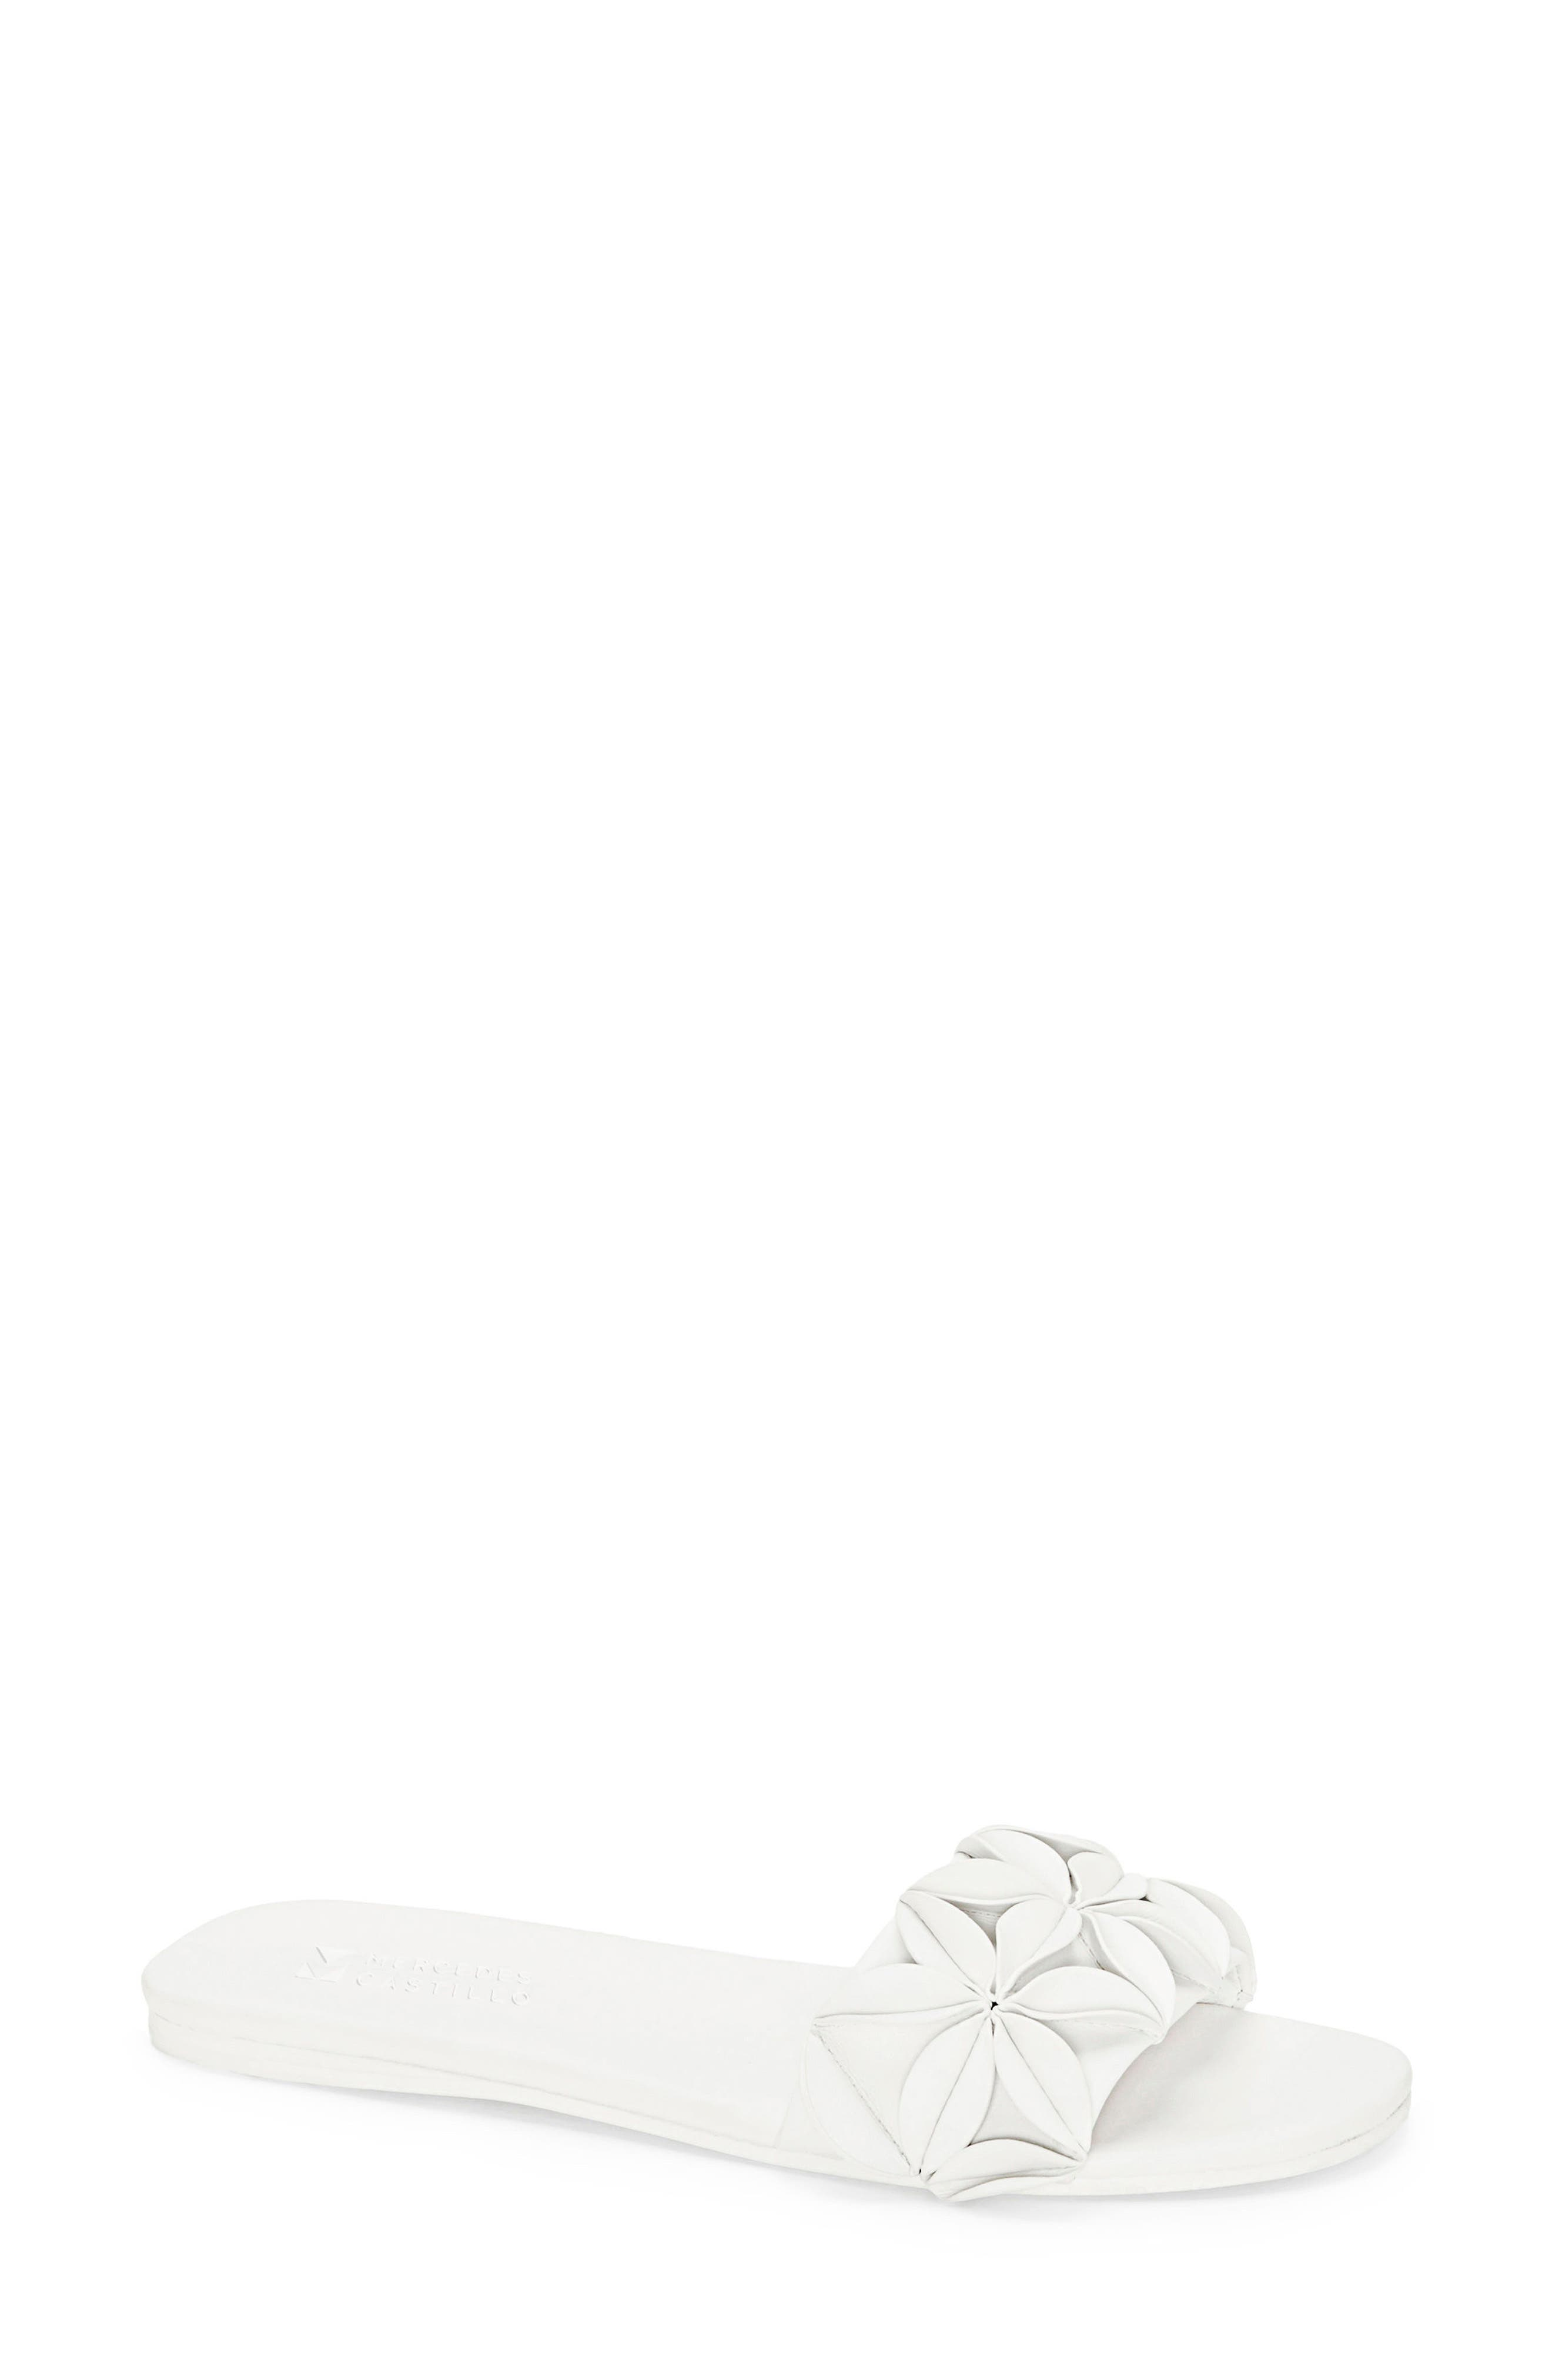 Matilda Slide Sandal,                             Main thumbnail 1, color,                             White